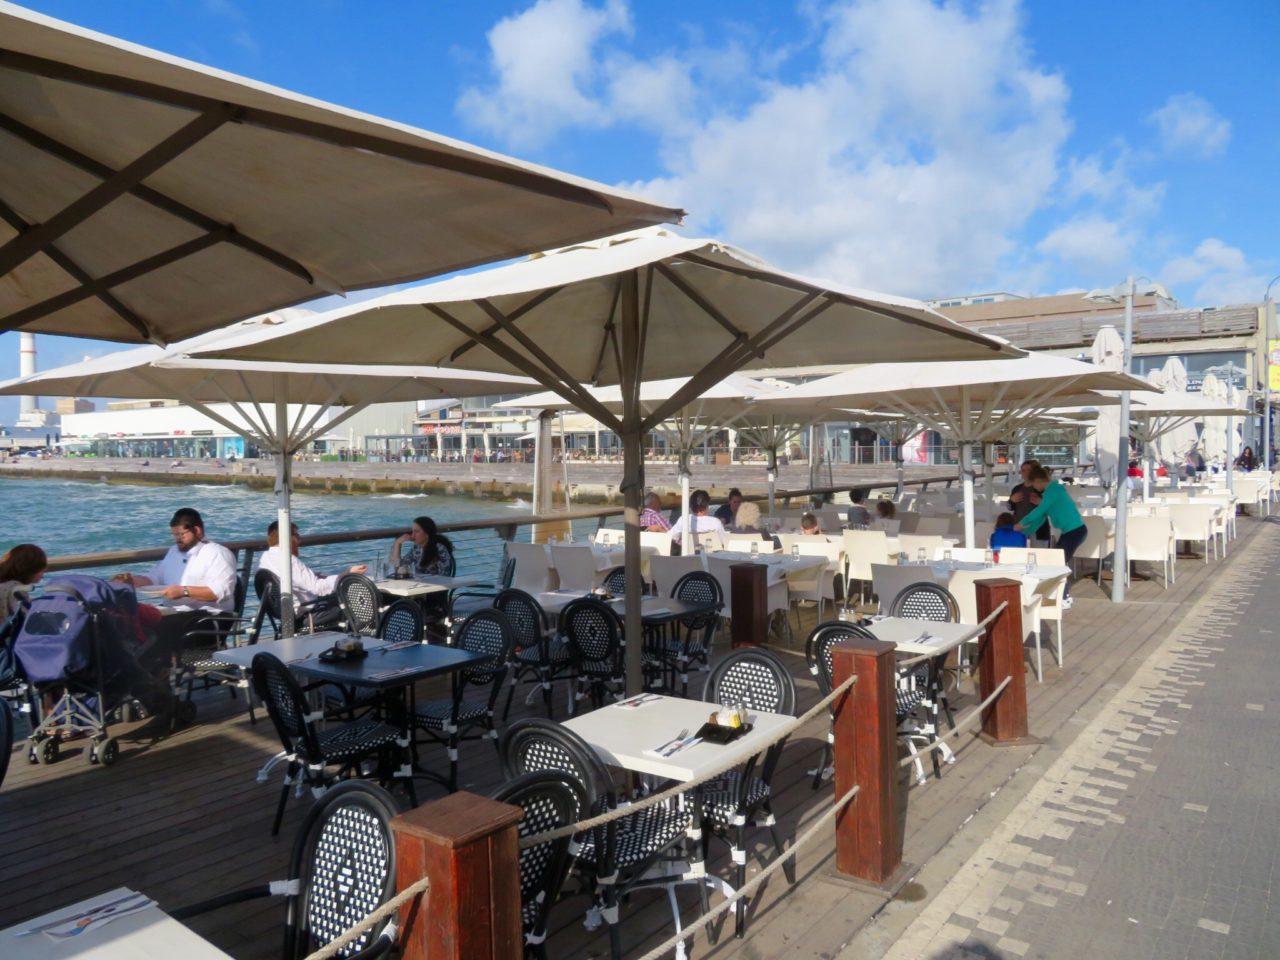 Tel Aviv Beach : Restaurants and shops now occupy the buildings of the Old Port of Tel Aviv